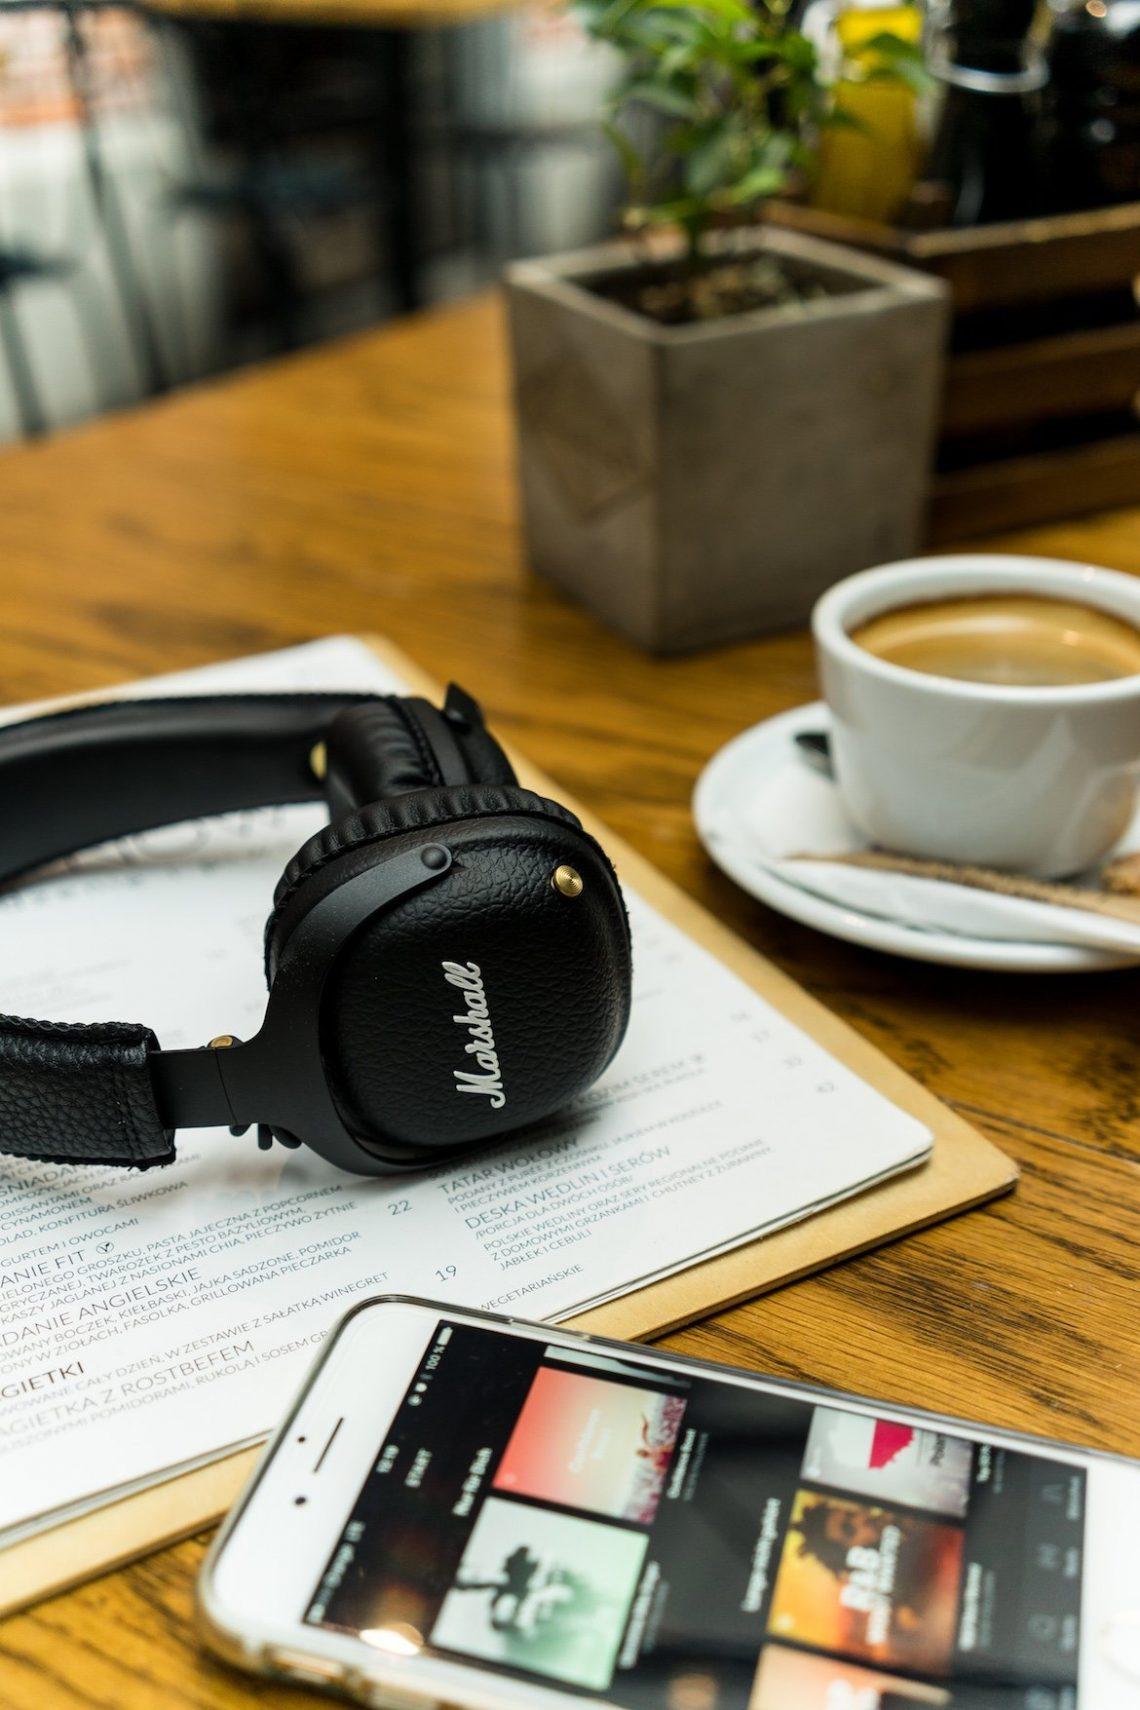 Marshall Headphones iPhone 7 Spotify App Cappuccino Pflanze